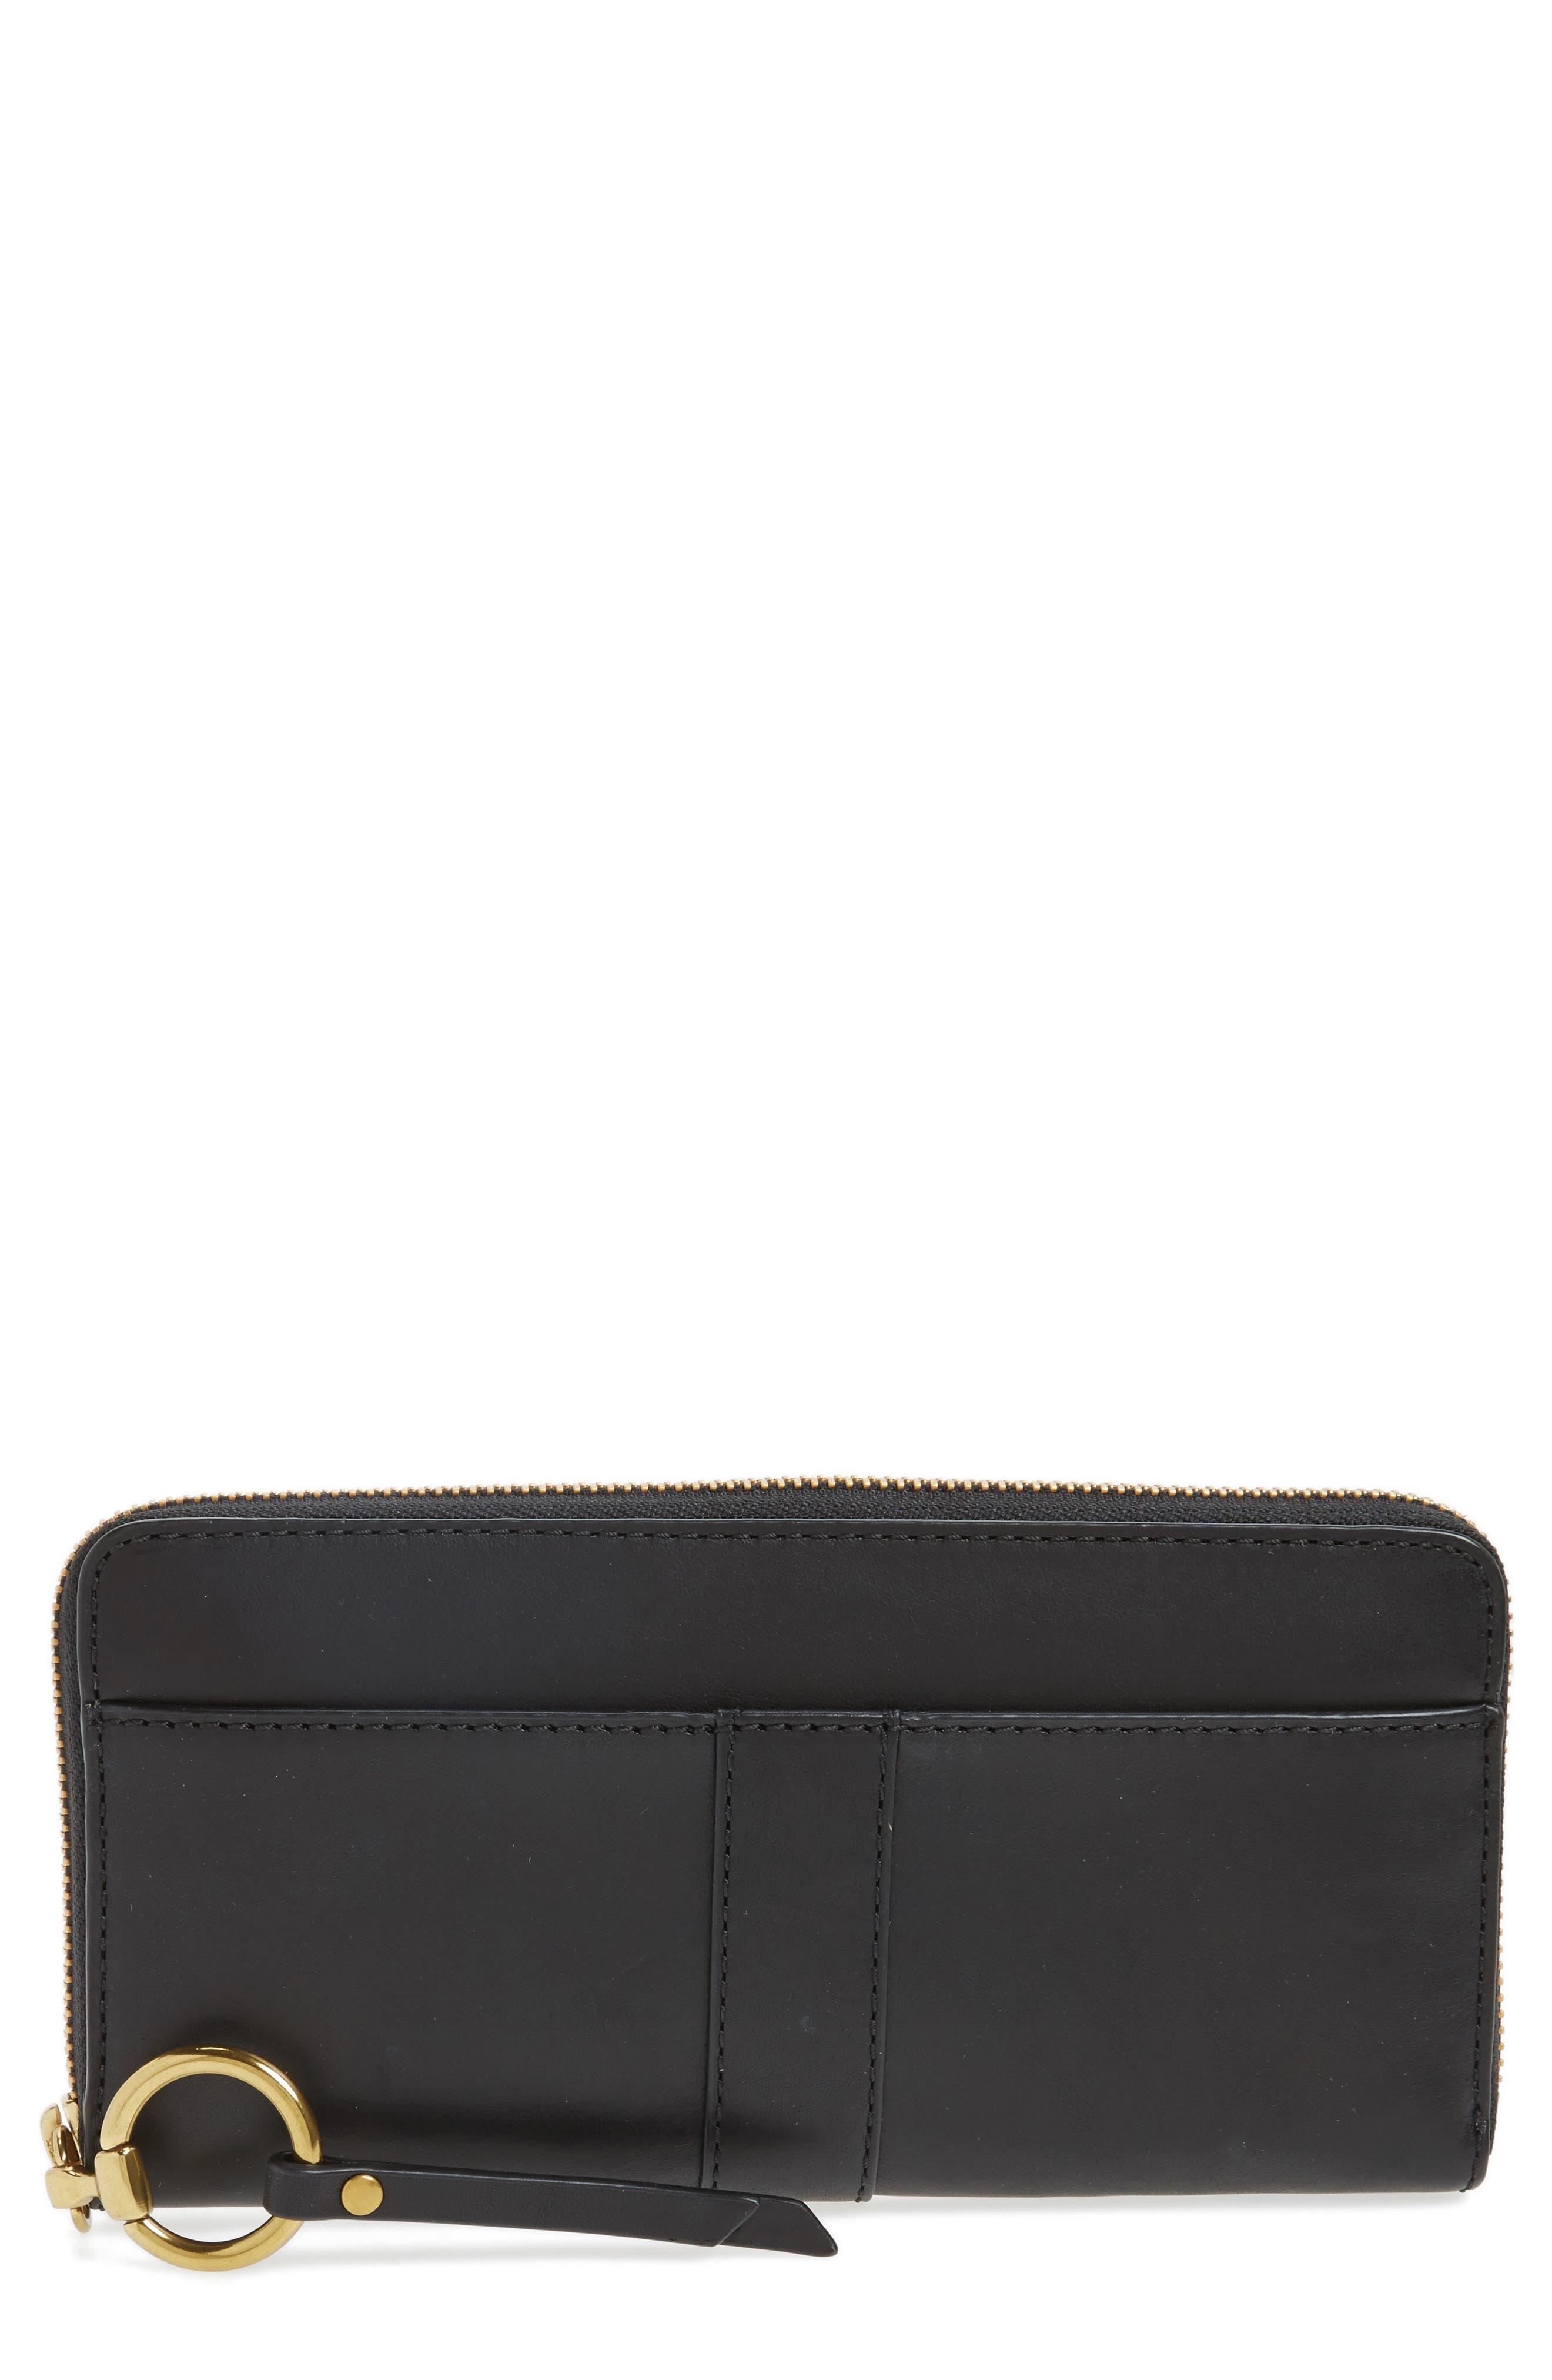 Ilana Harness Leather Zip Wallet,                             Main thumbnail 1, color,                             001